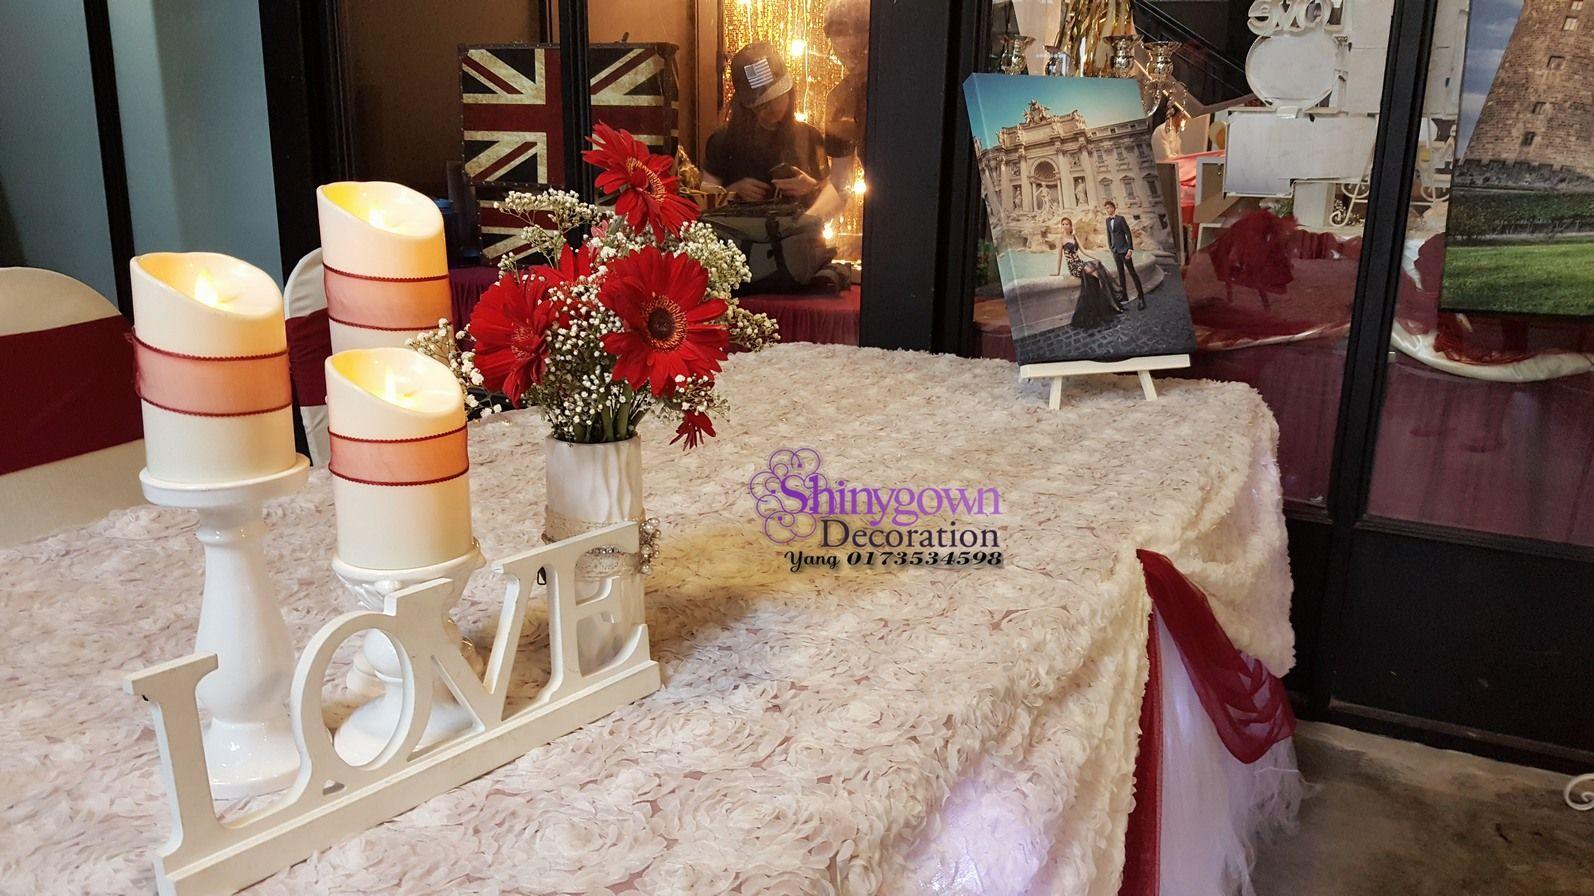 Pin by yang xue shinygown on malaysia wedding decoration malaysia wedding decorations weddings bodas wedding decor wedding junglespirit Images